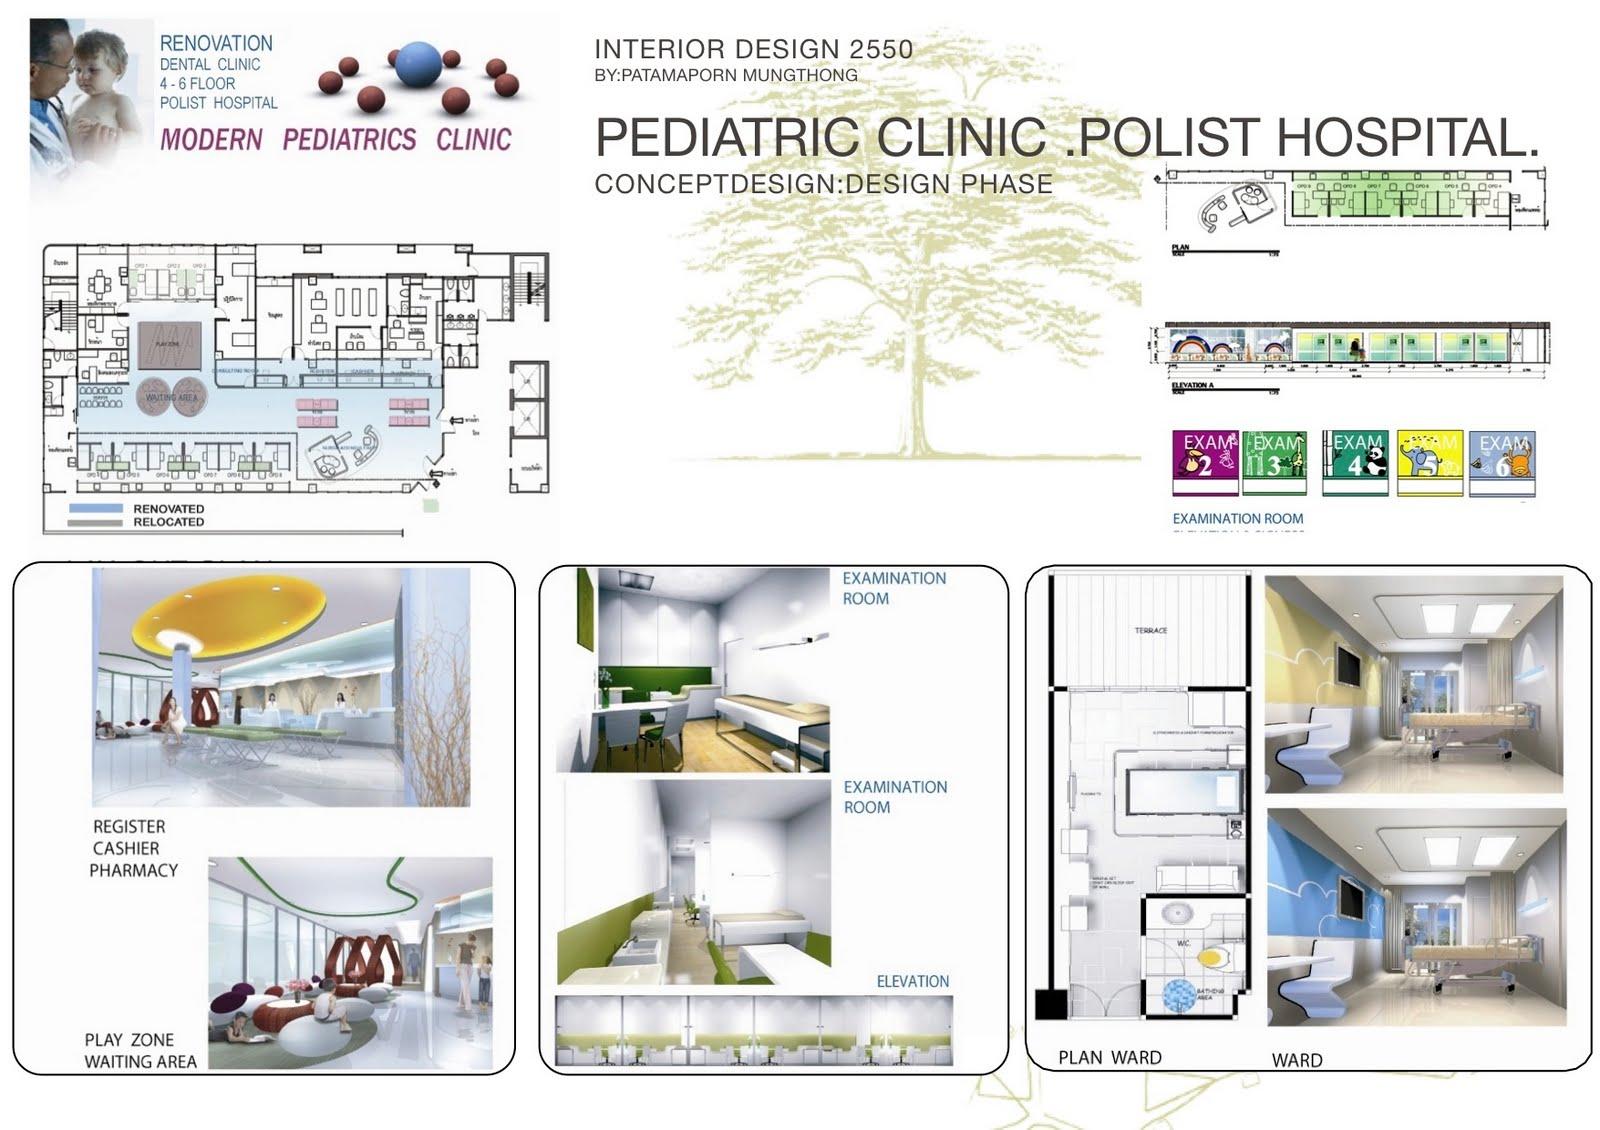 Hospital Design 2550 51 By Patamaporn Mungthong Interior Design Blueculture